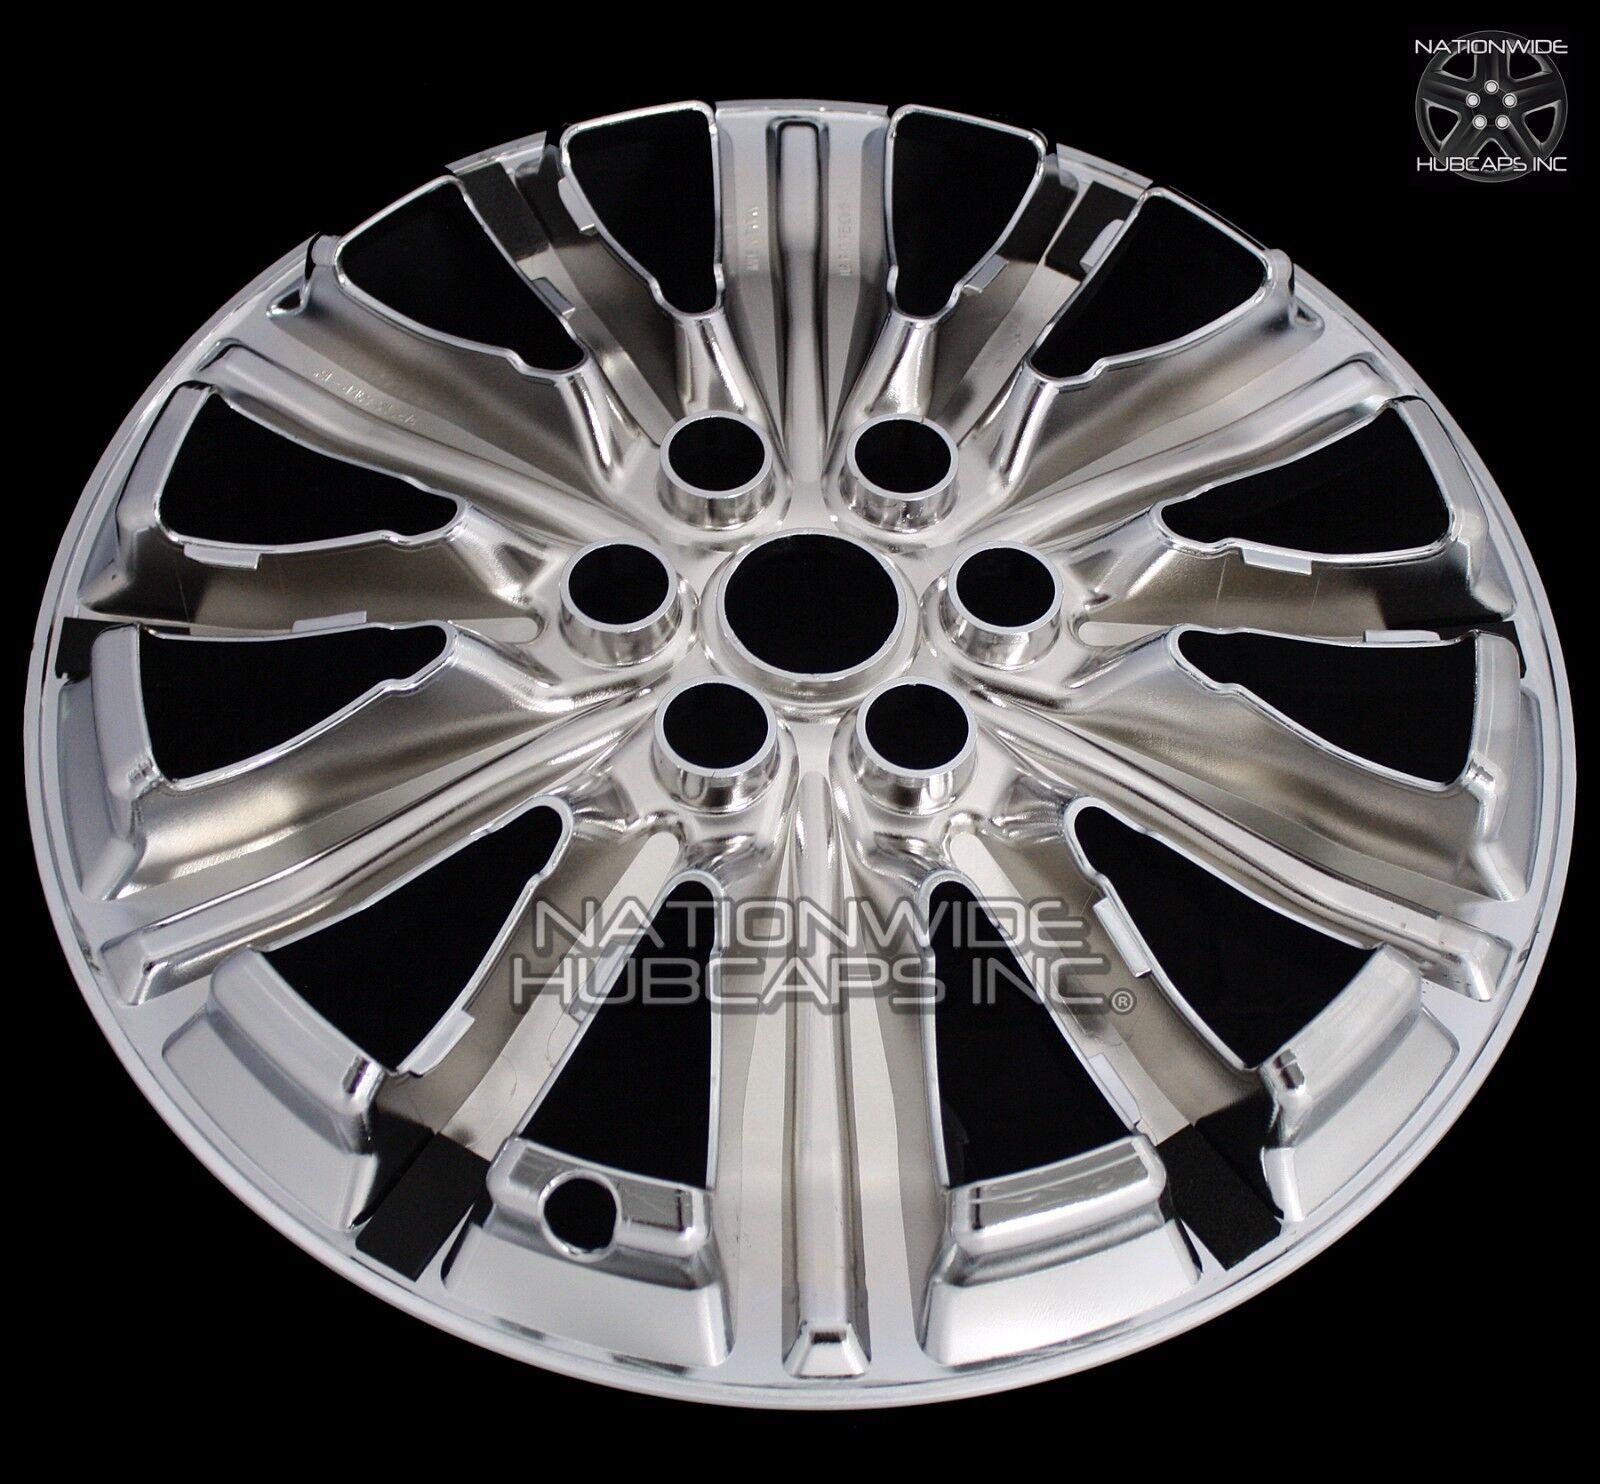 DNJ MB167 Standard Main Bearings Set For 07-16 Chrysler Mitsubishi 1.8 2.4 4B11